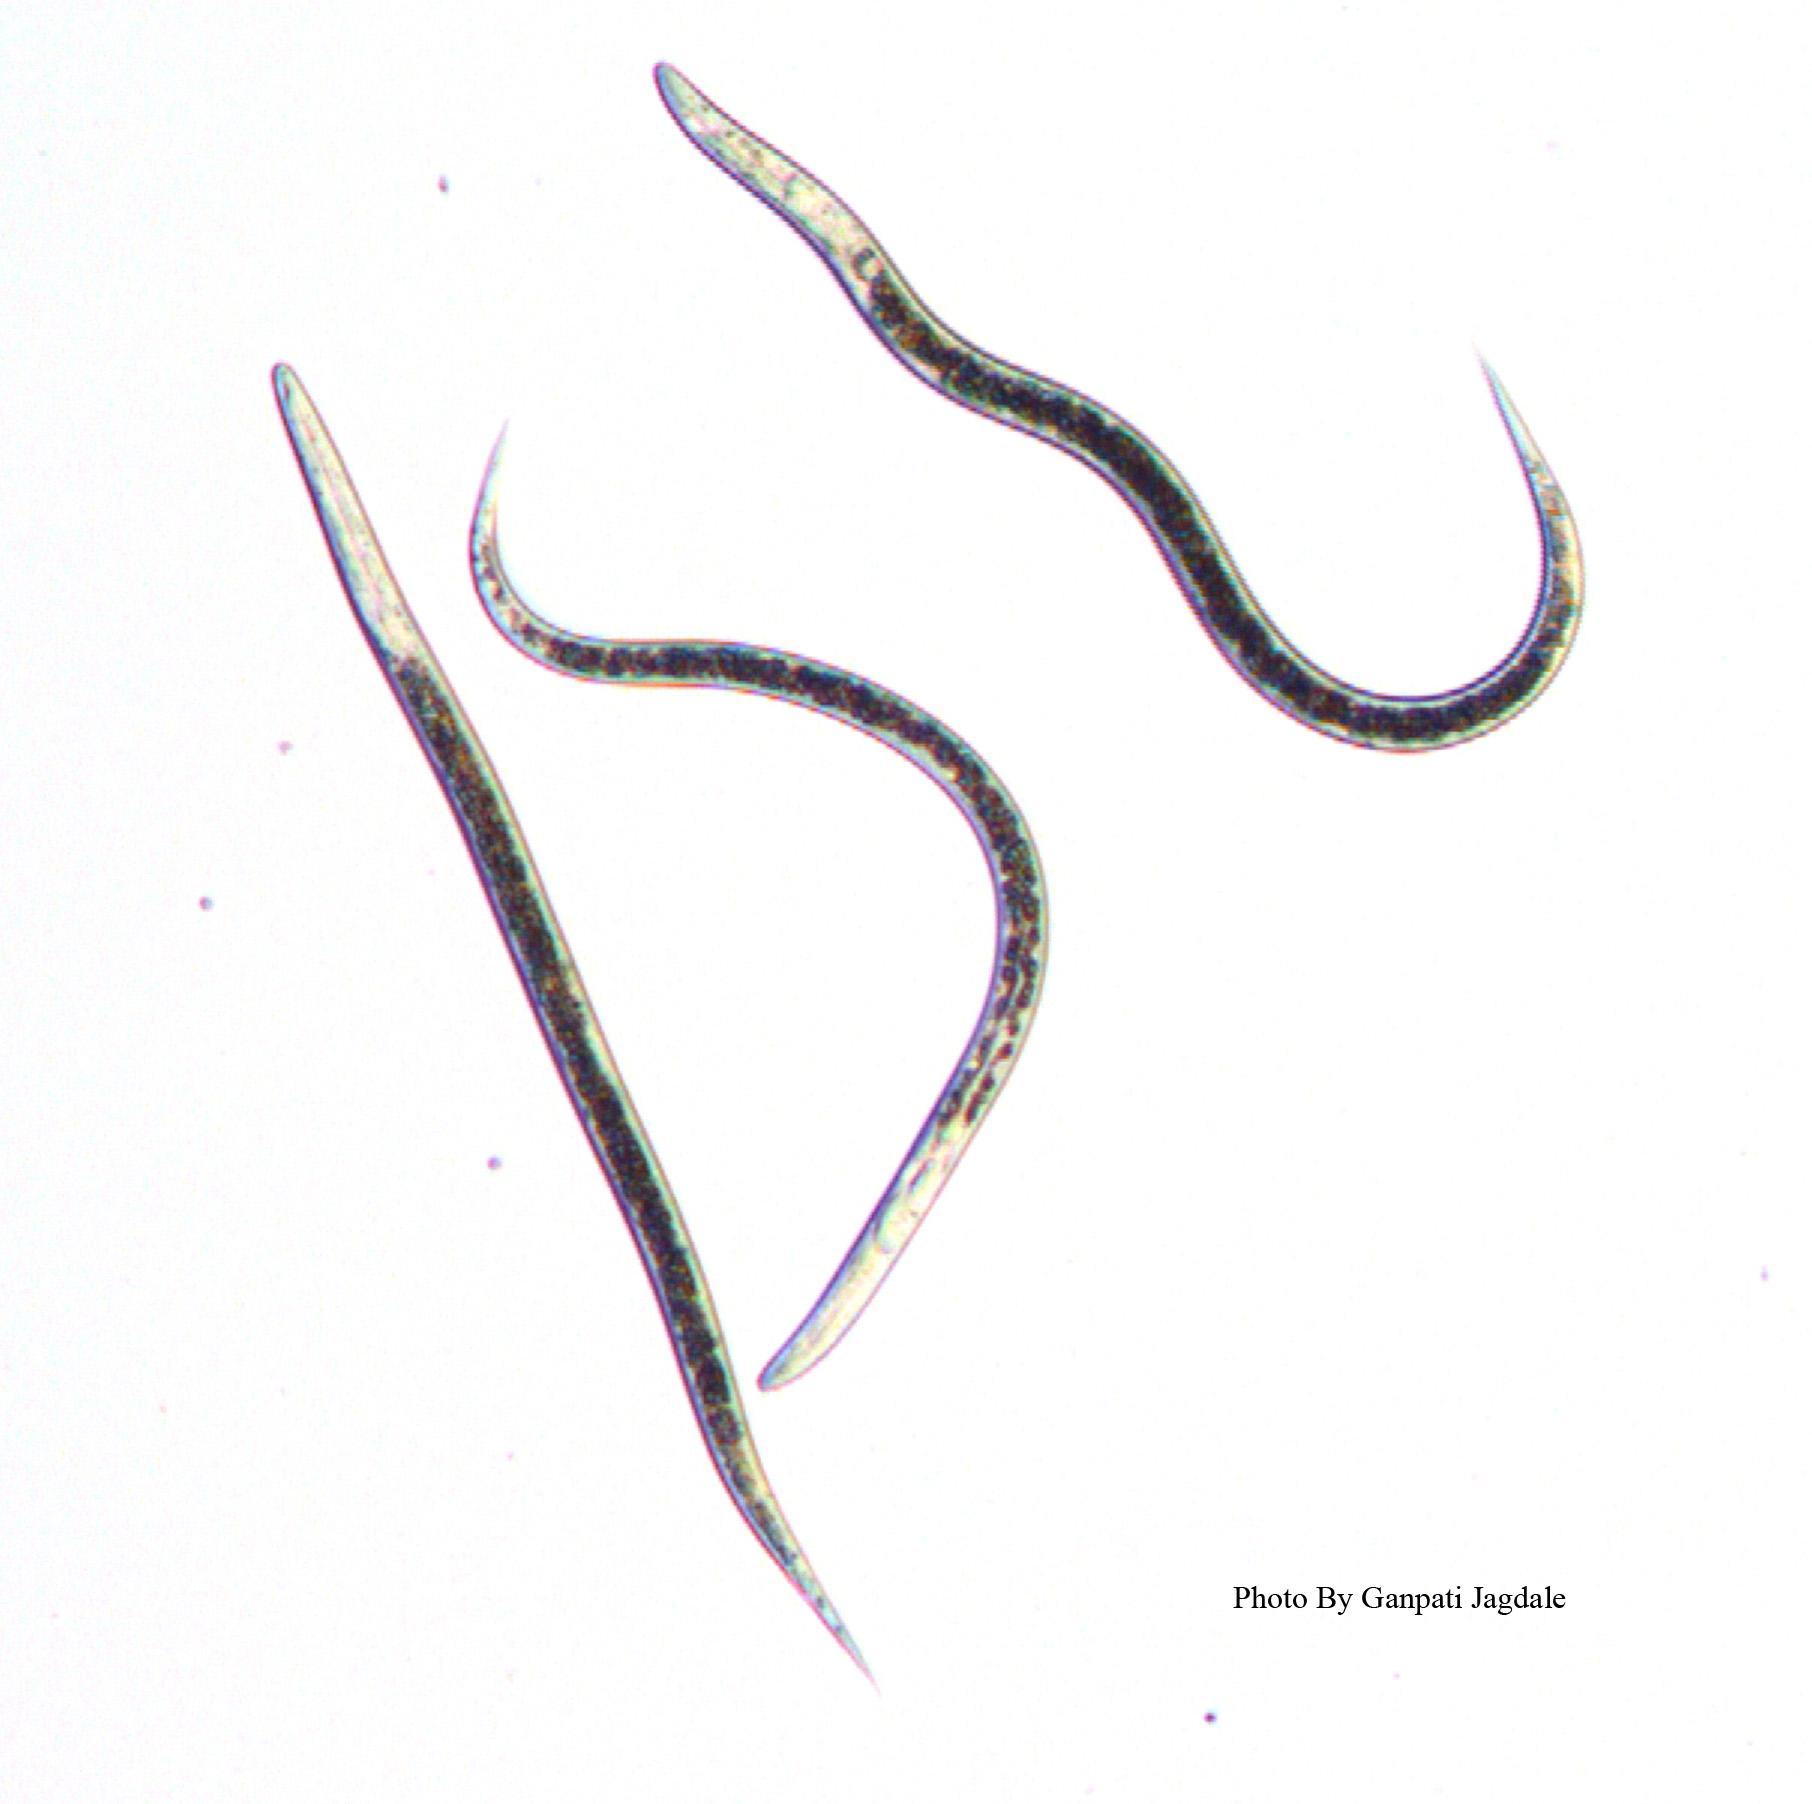 Infective Juveniles of entomopathogenic nematodes